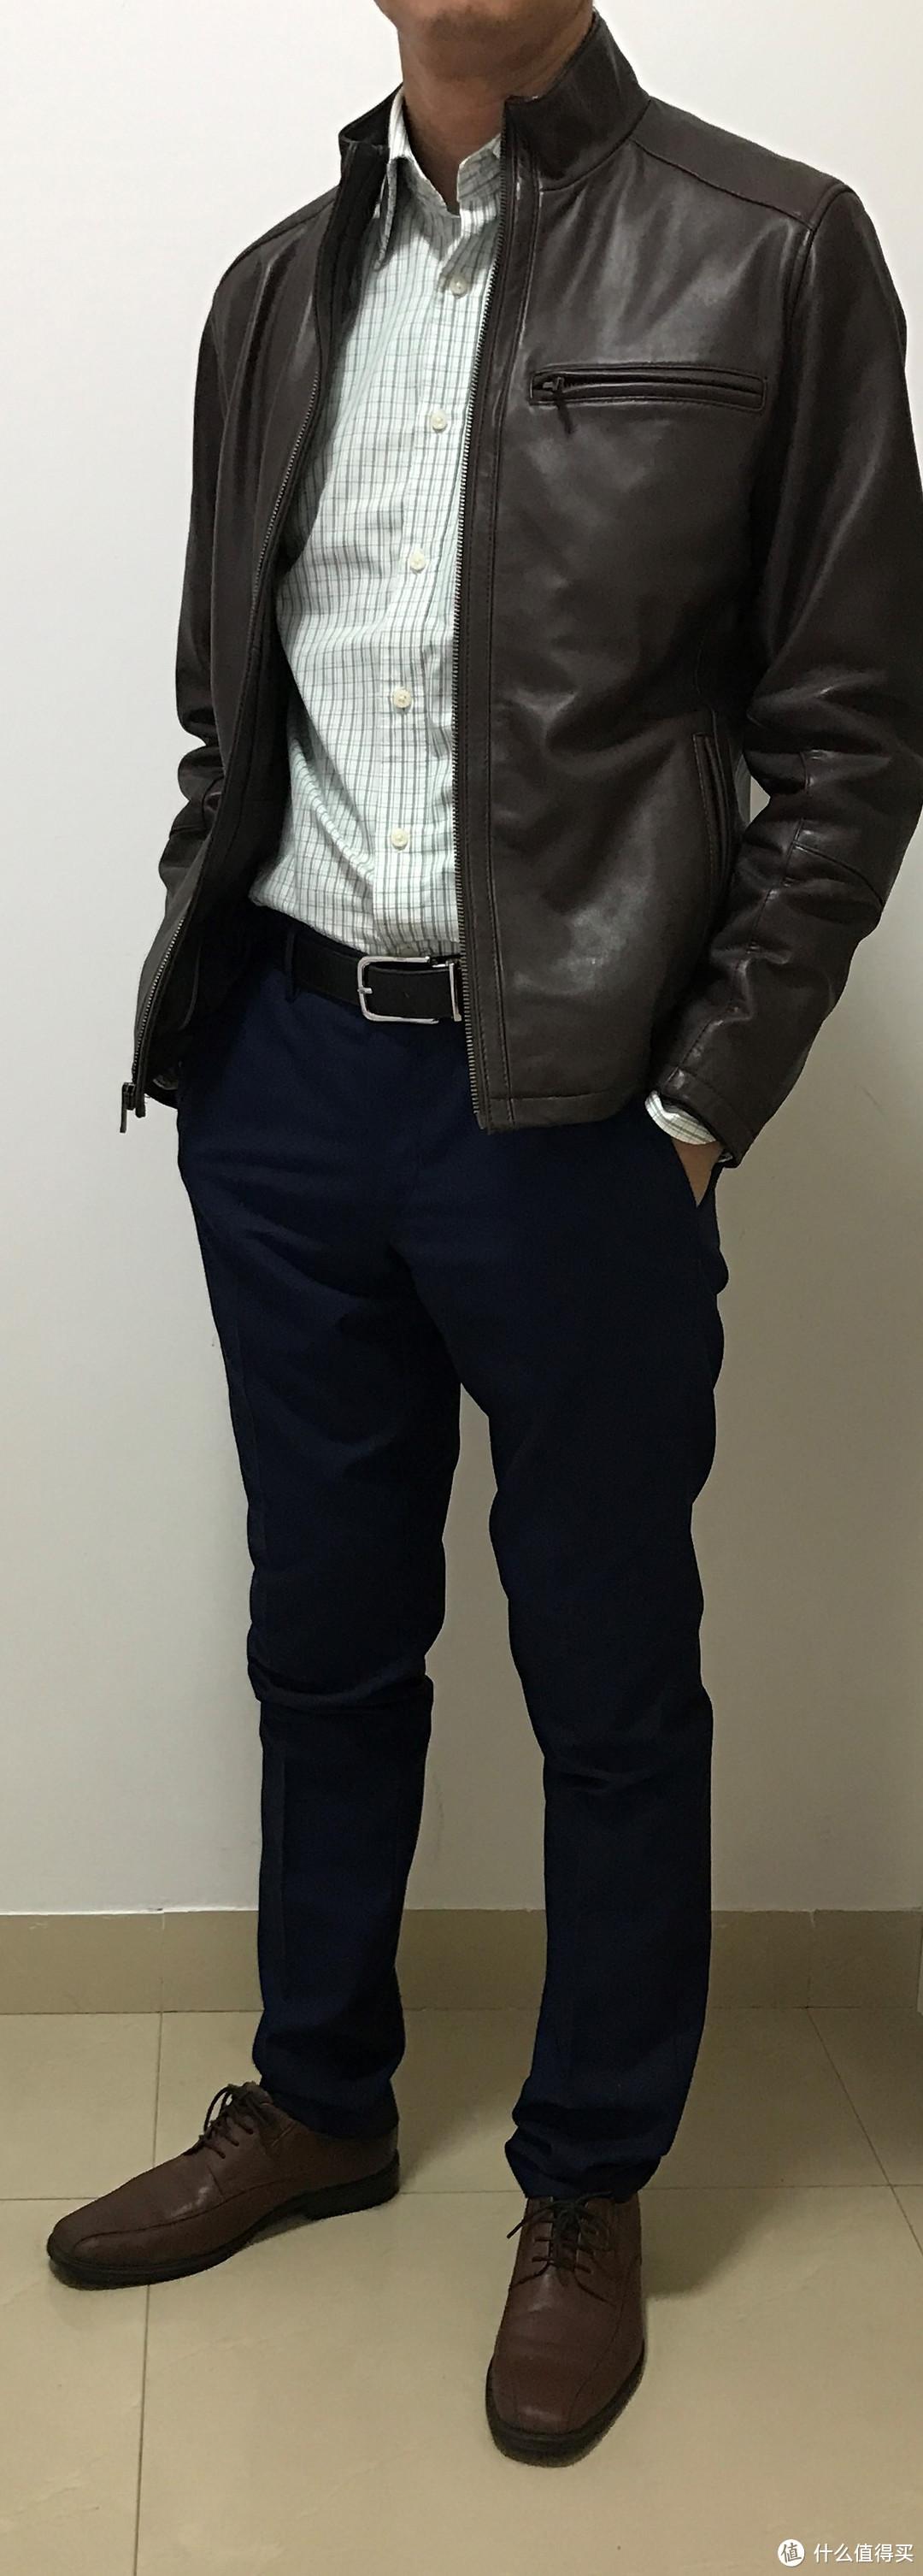 Boss Orange  Men's Jofynn Jacket  雨果 男士机车皮衣皮夹克 开箱以及上身照